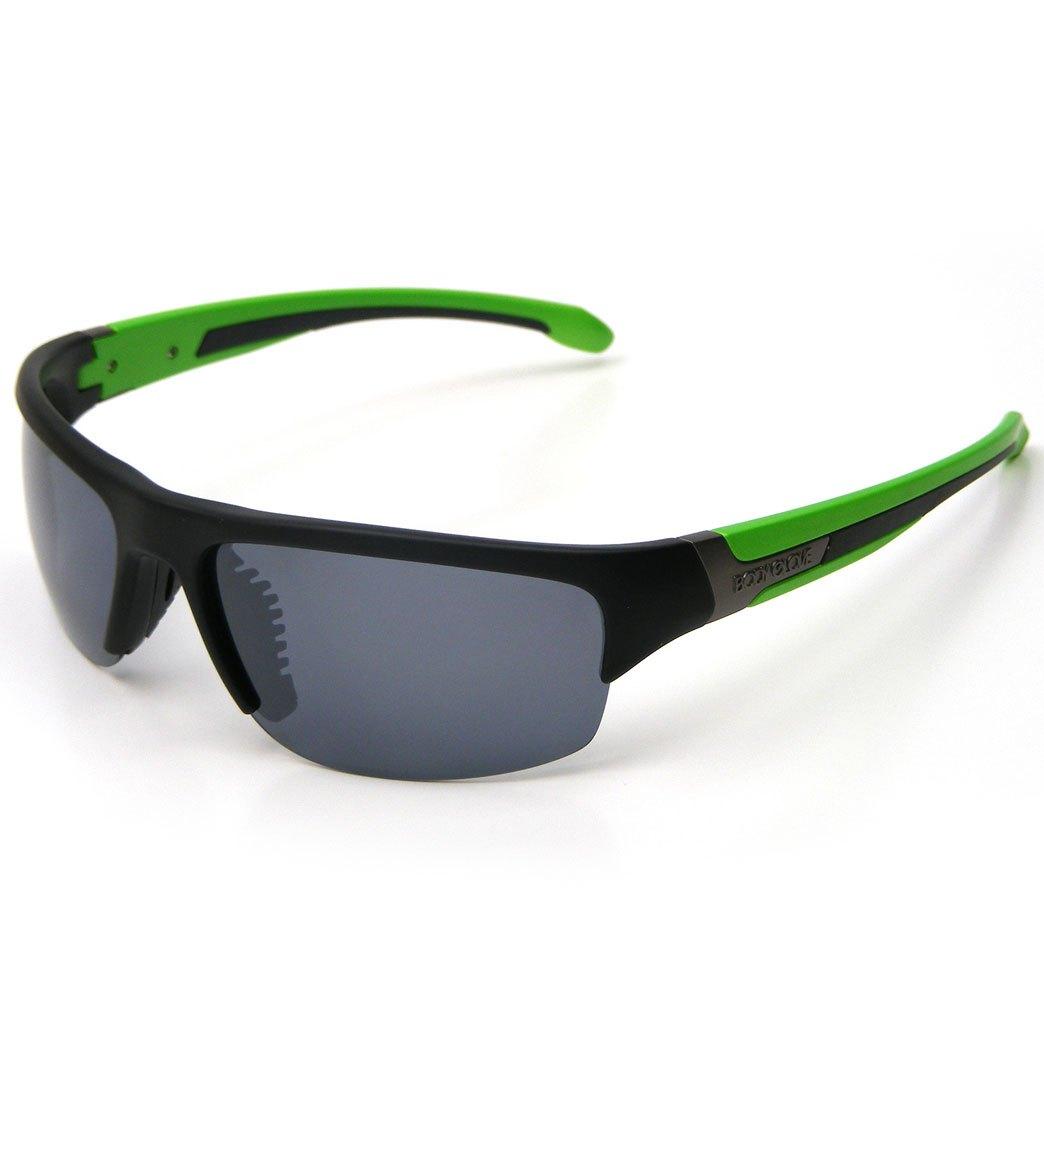 7e11d912ae Body Glove Vapor 20 Matte Polarized Sunglasses